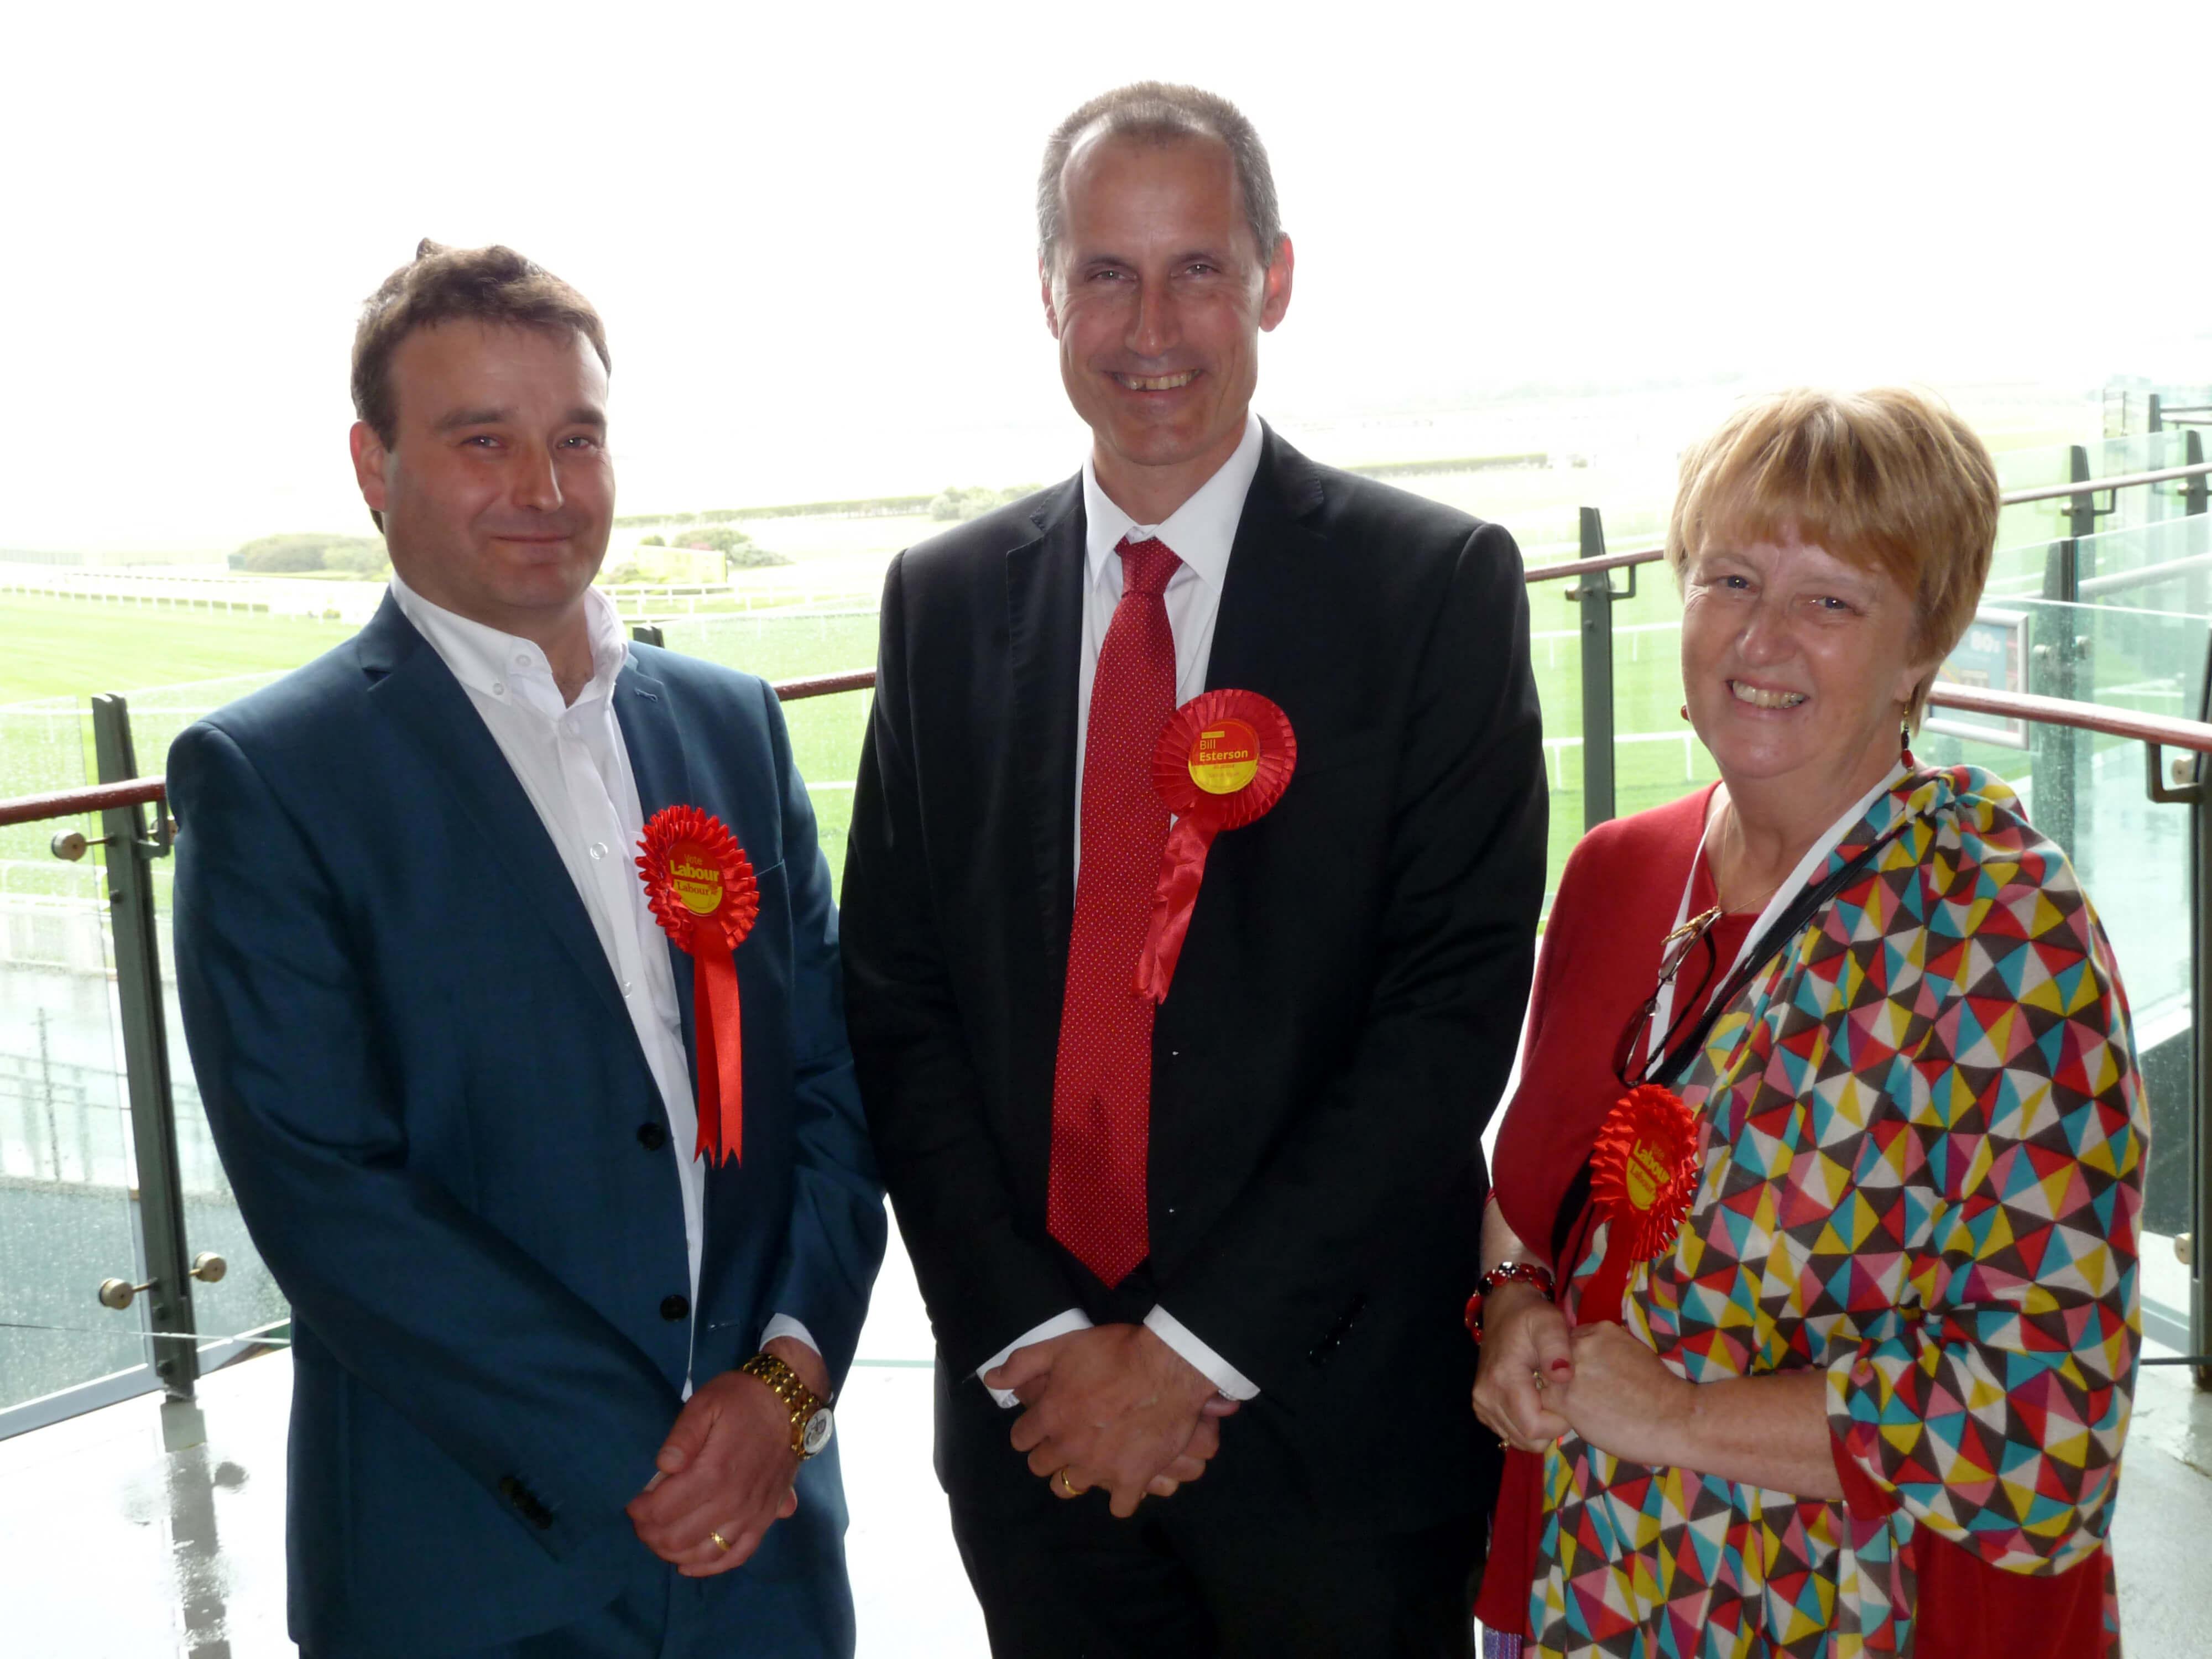 Ravenmeols Ward Labour councillors Tim Hale and Catie Page with Sefton Central Labour MP Bill Esterson.